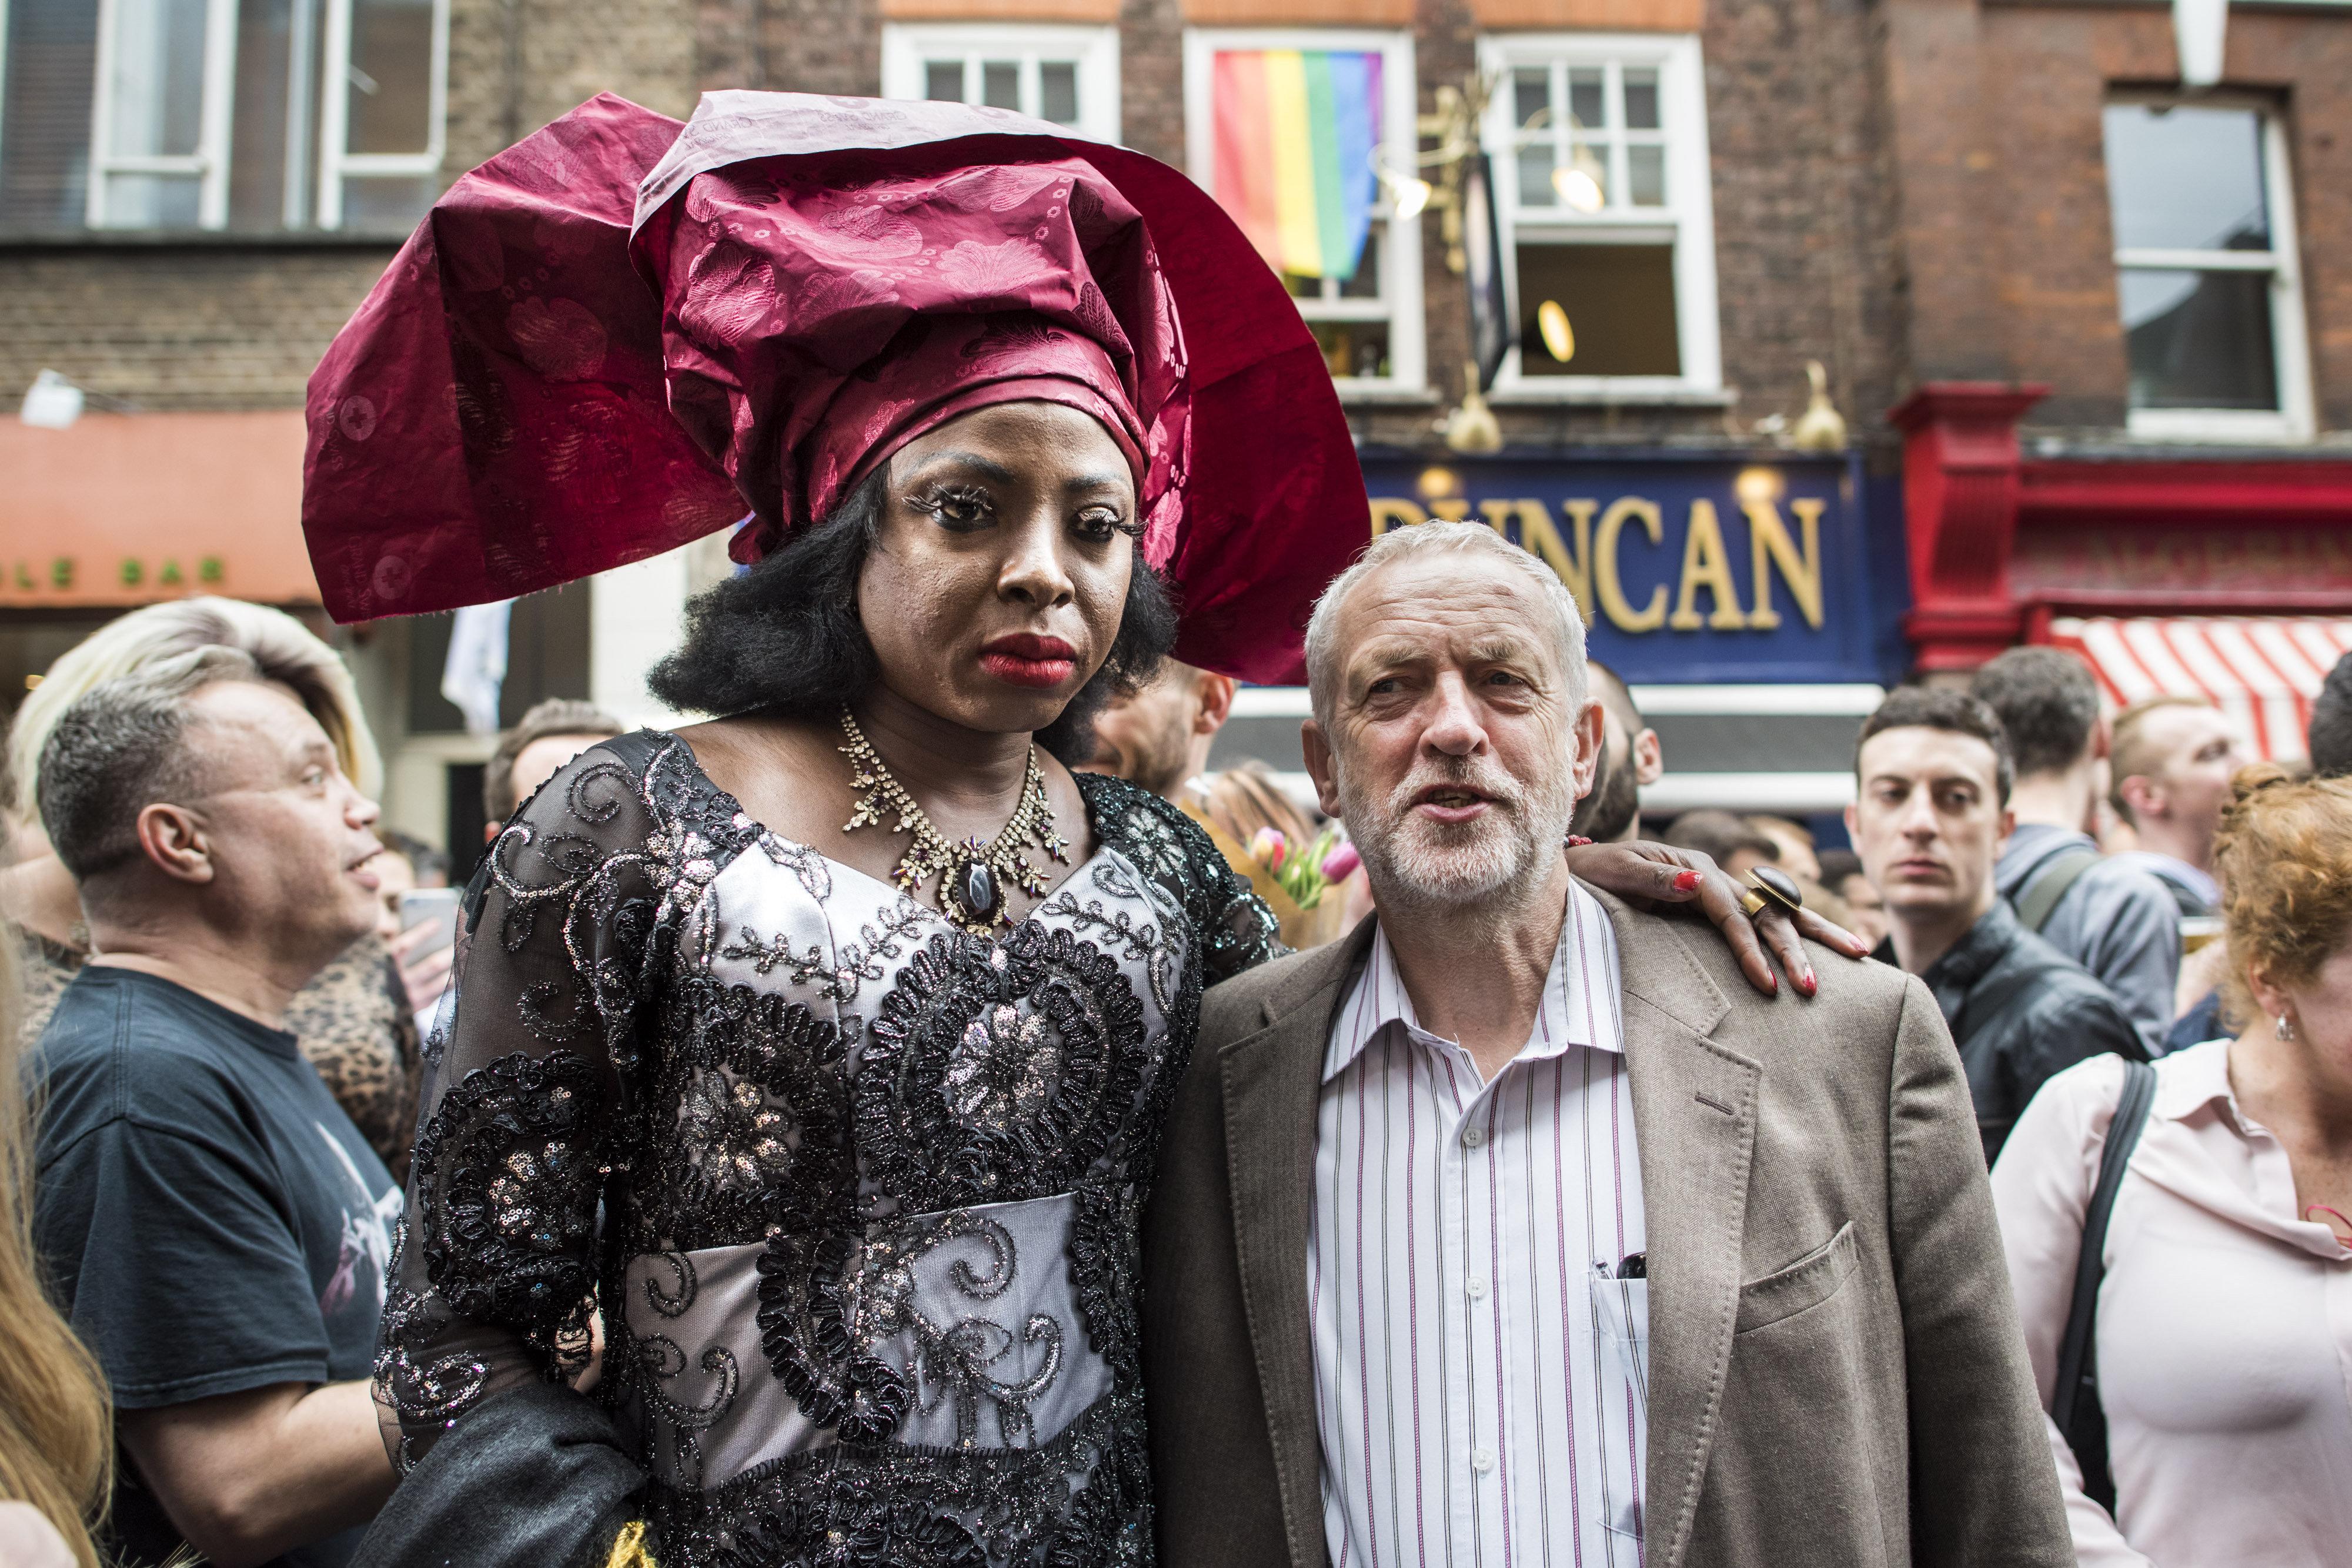 Labour leader Jeremy Corbyn joined members of London's LGBTI community, when they helda vigil in...